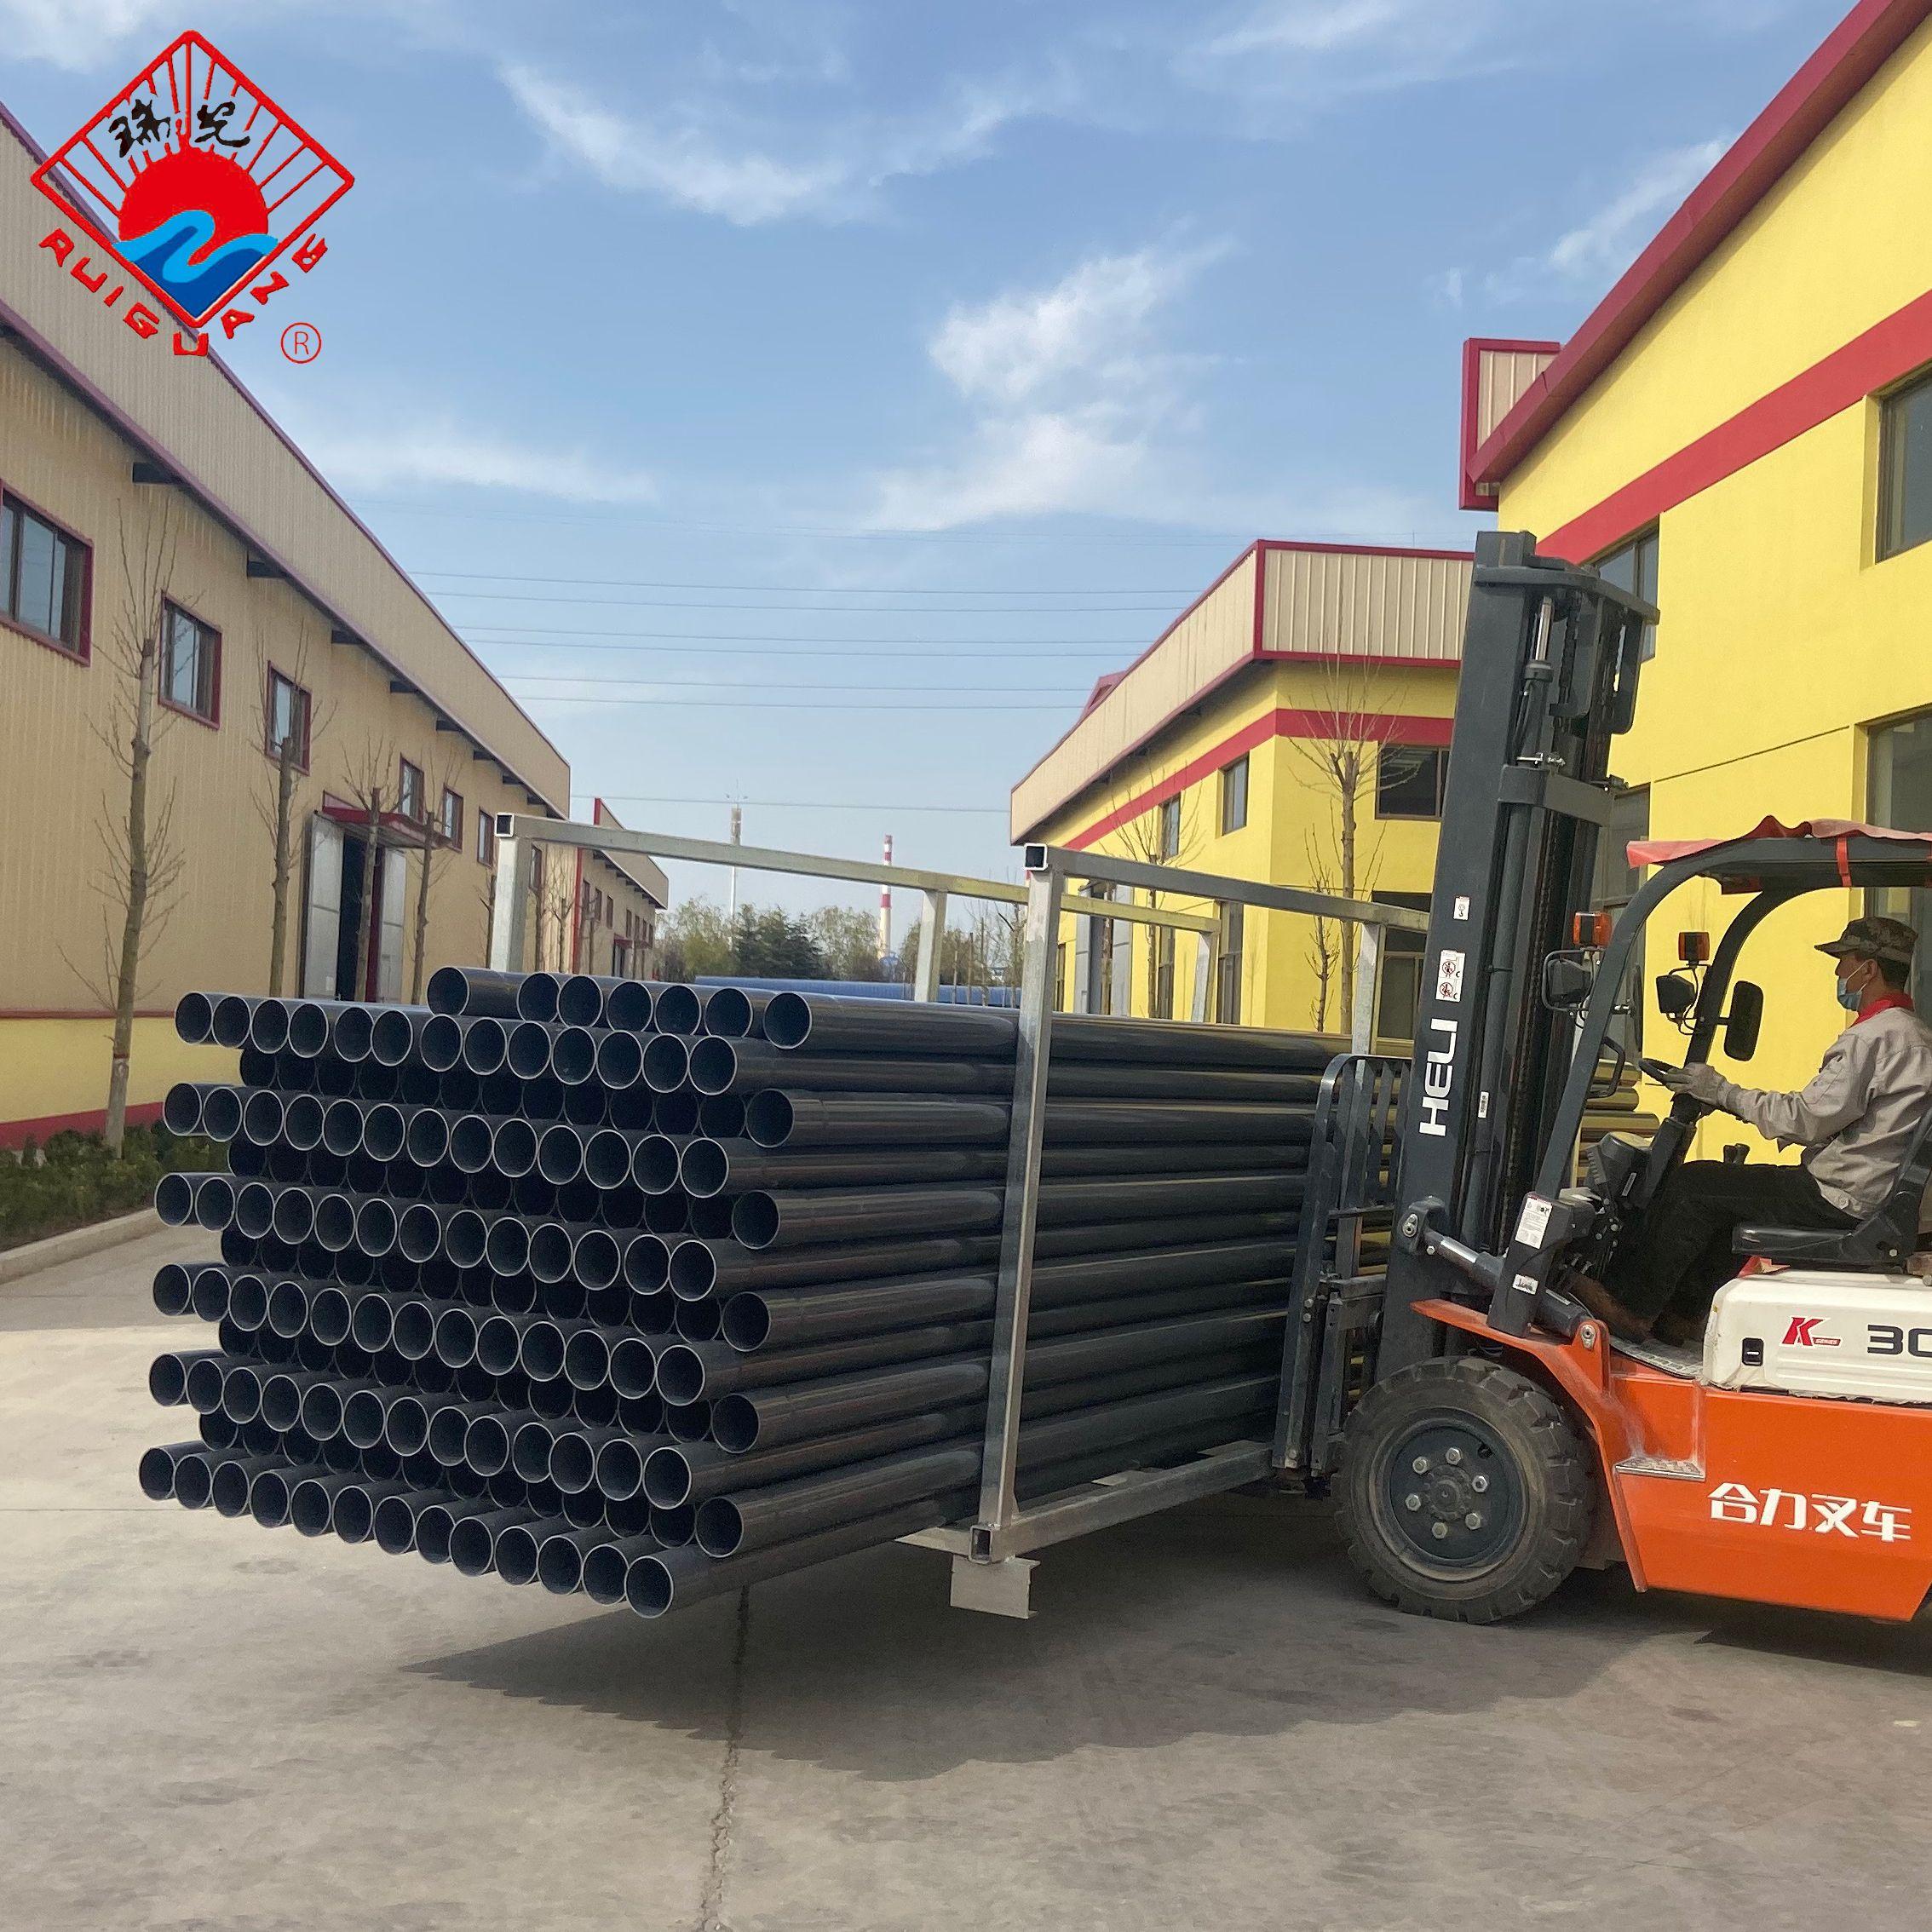 pvc給水管材PVC農田灌溉管材pvc市政自來水管PVC抽水管PVC自來水管